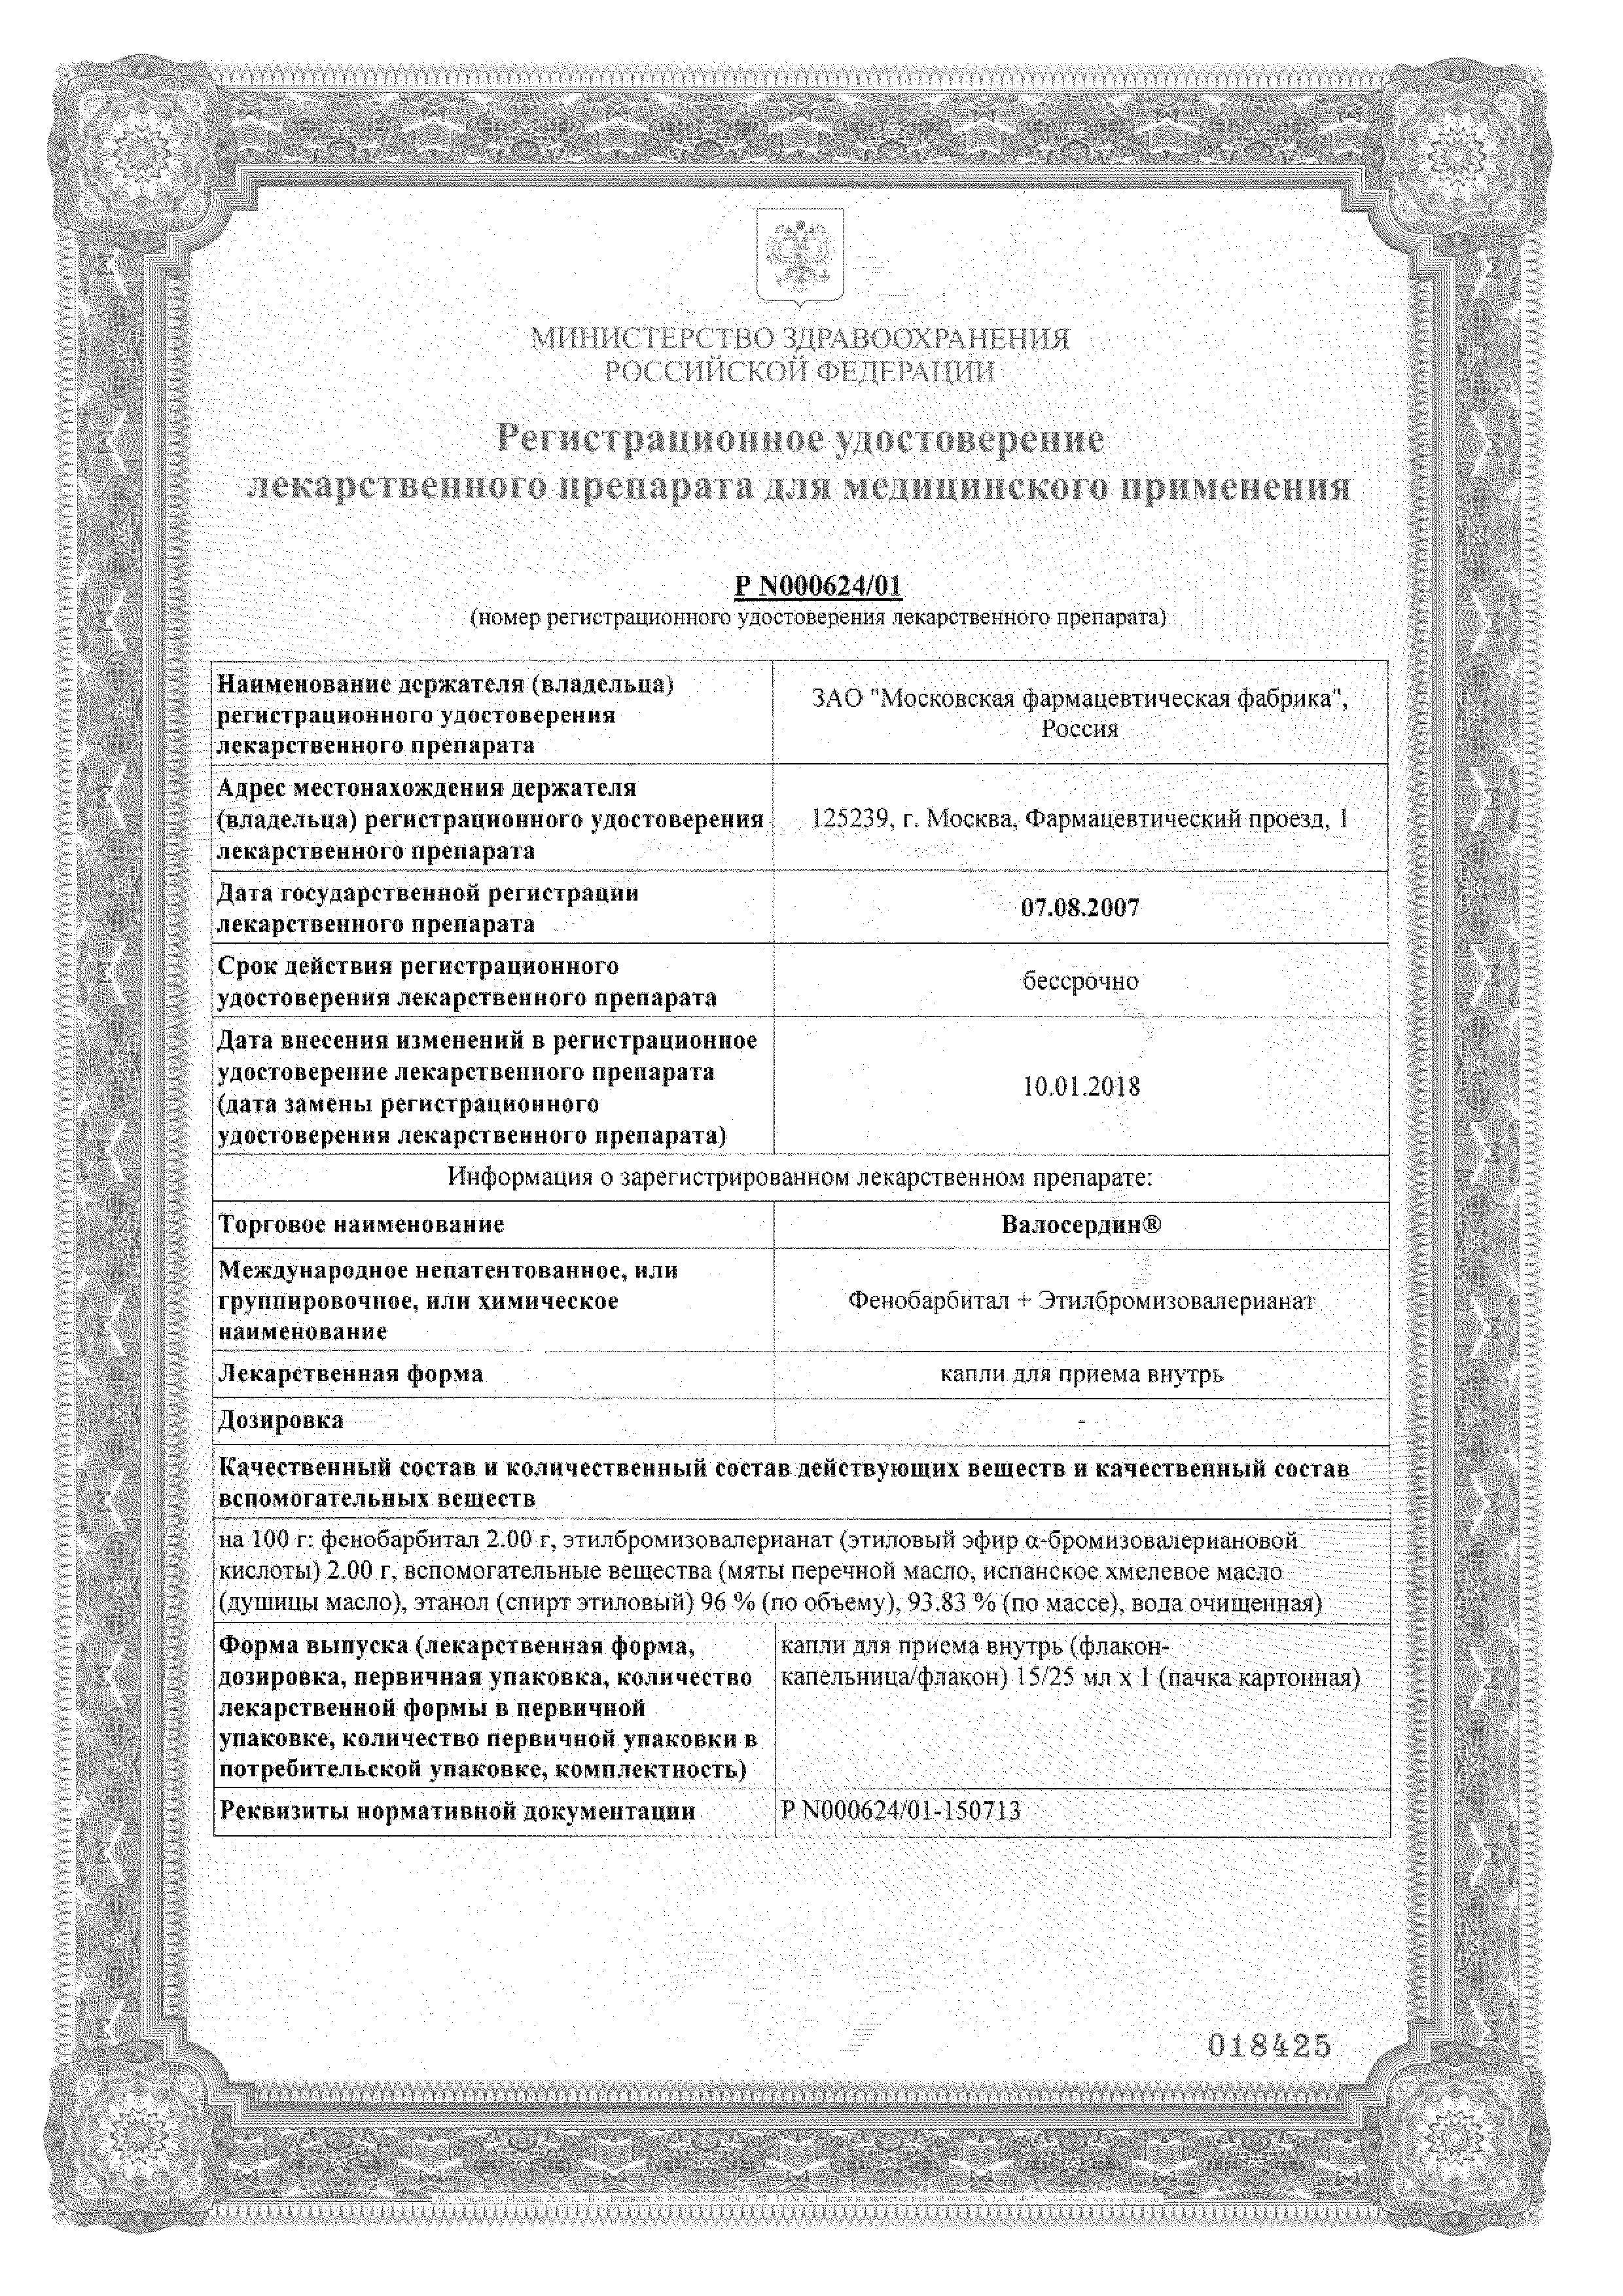 Валосердин сертификат